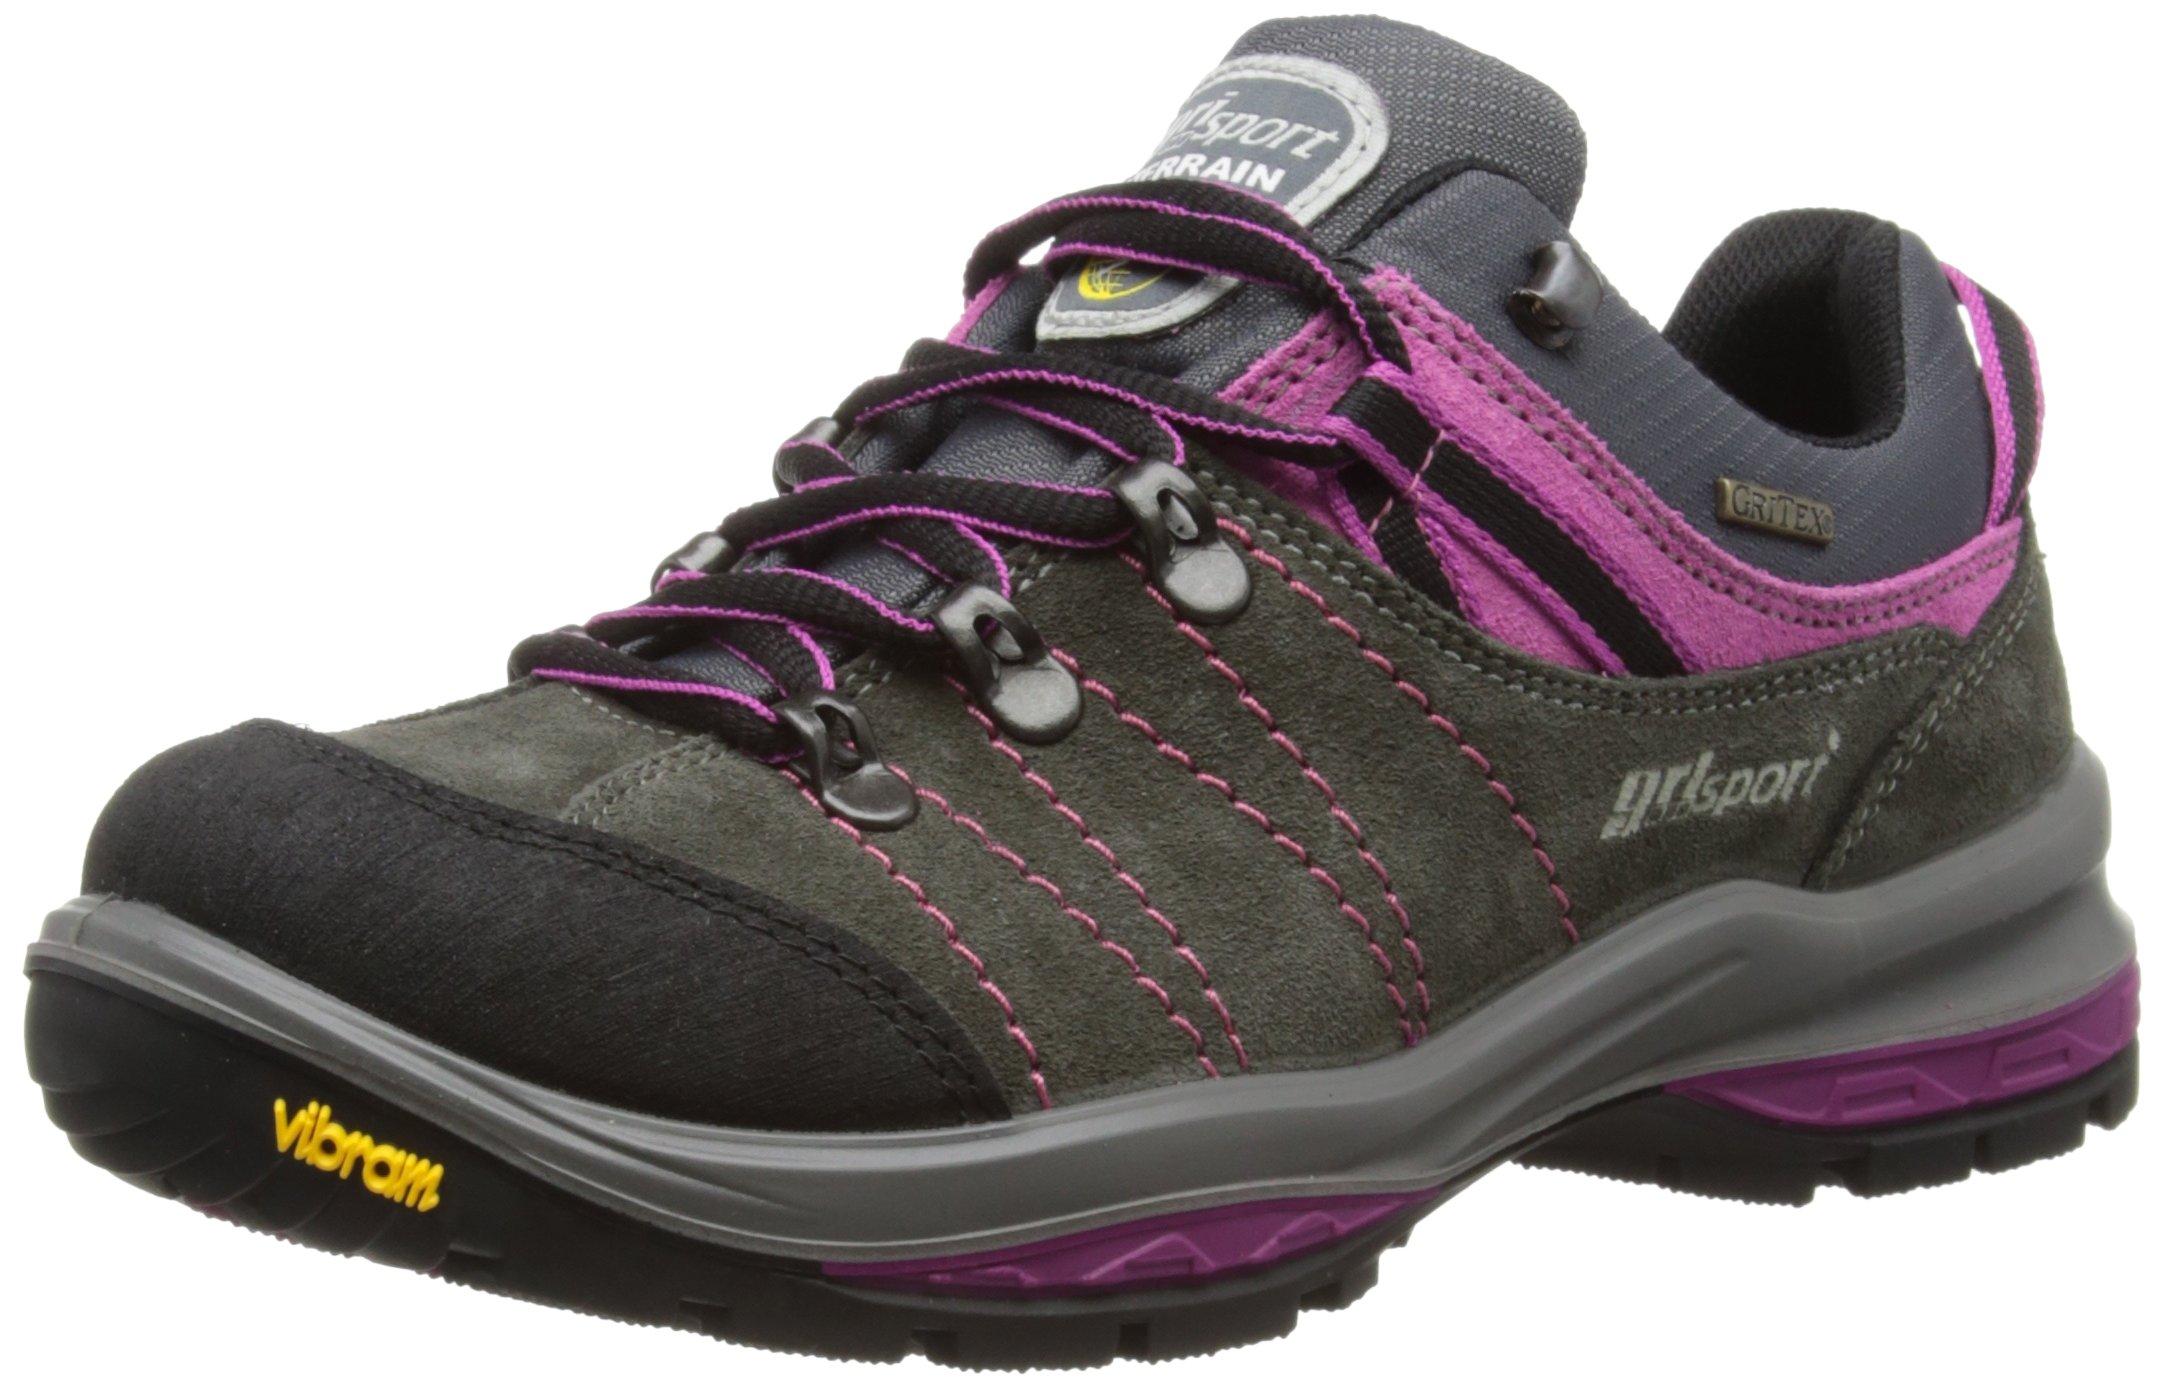 81o6C0lqTaL - Grisport Womens Magma-Lo Hiking Shoes